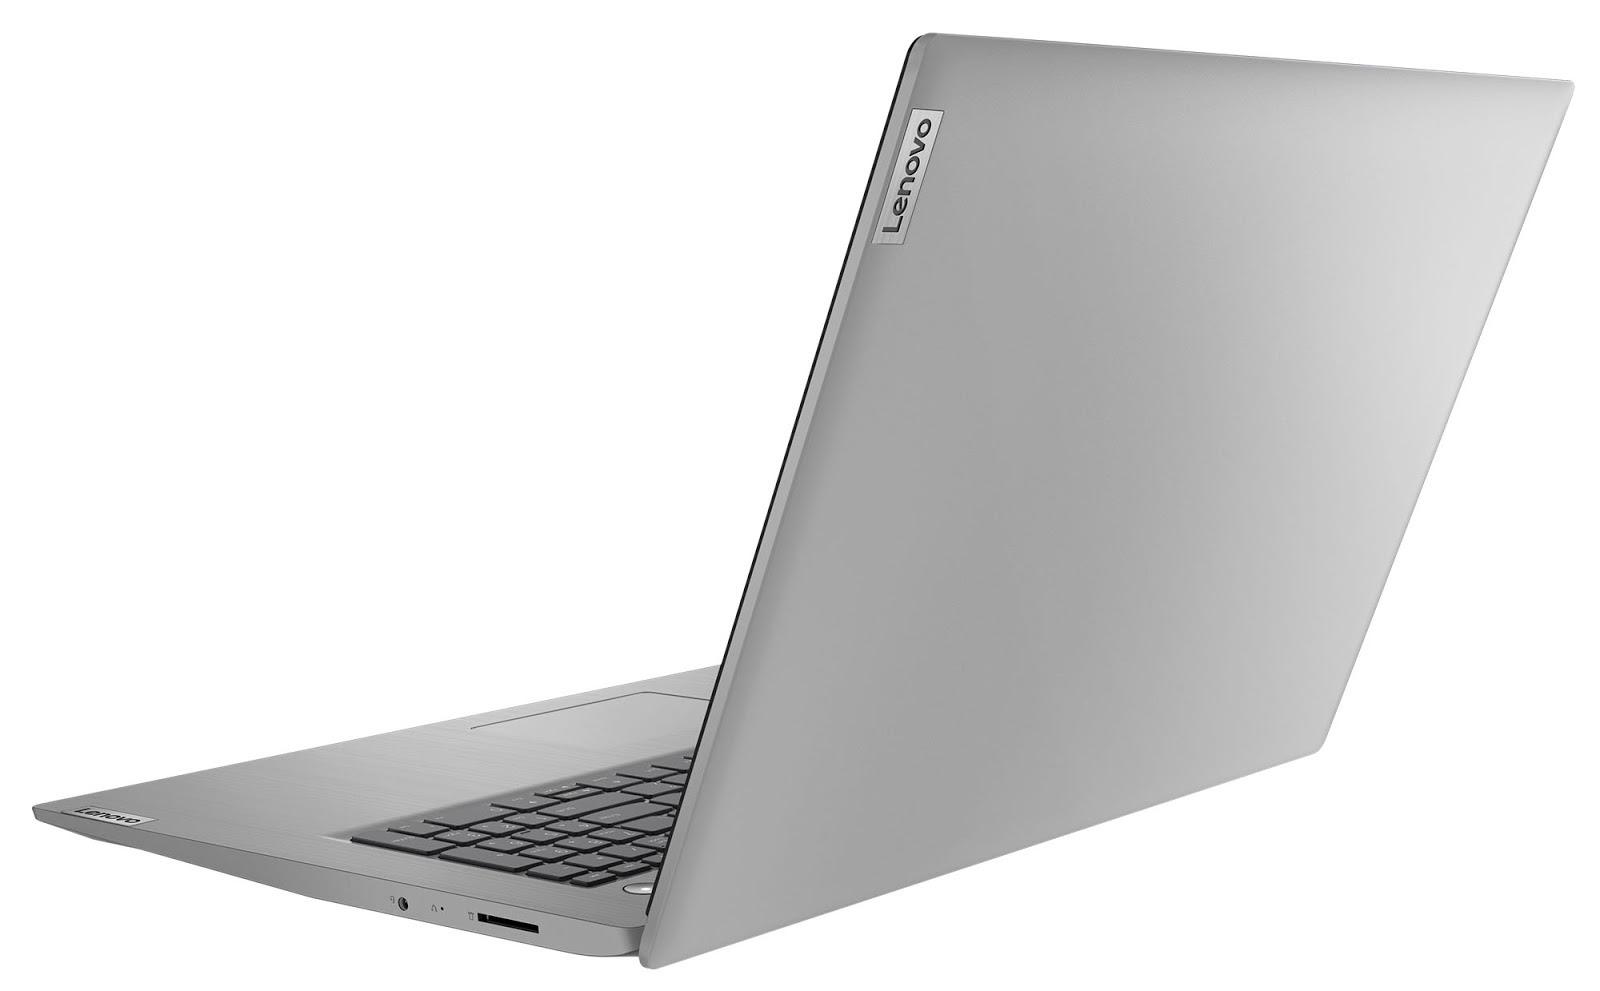 Фото 1. Ноутбук Lenovo ideapad 3 17IML05 Platinum Grey (81WC0012RE)